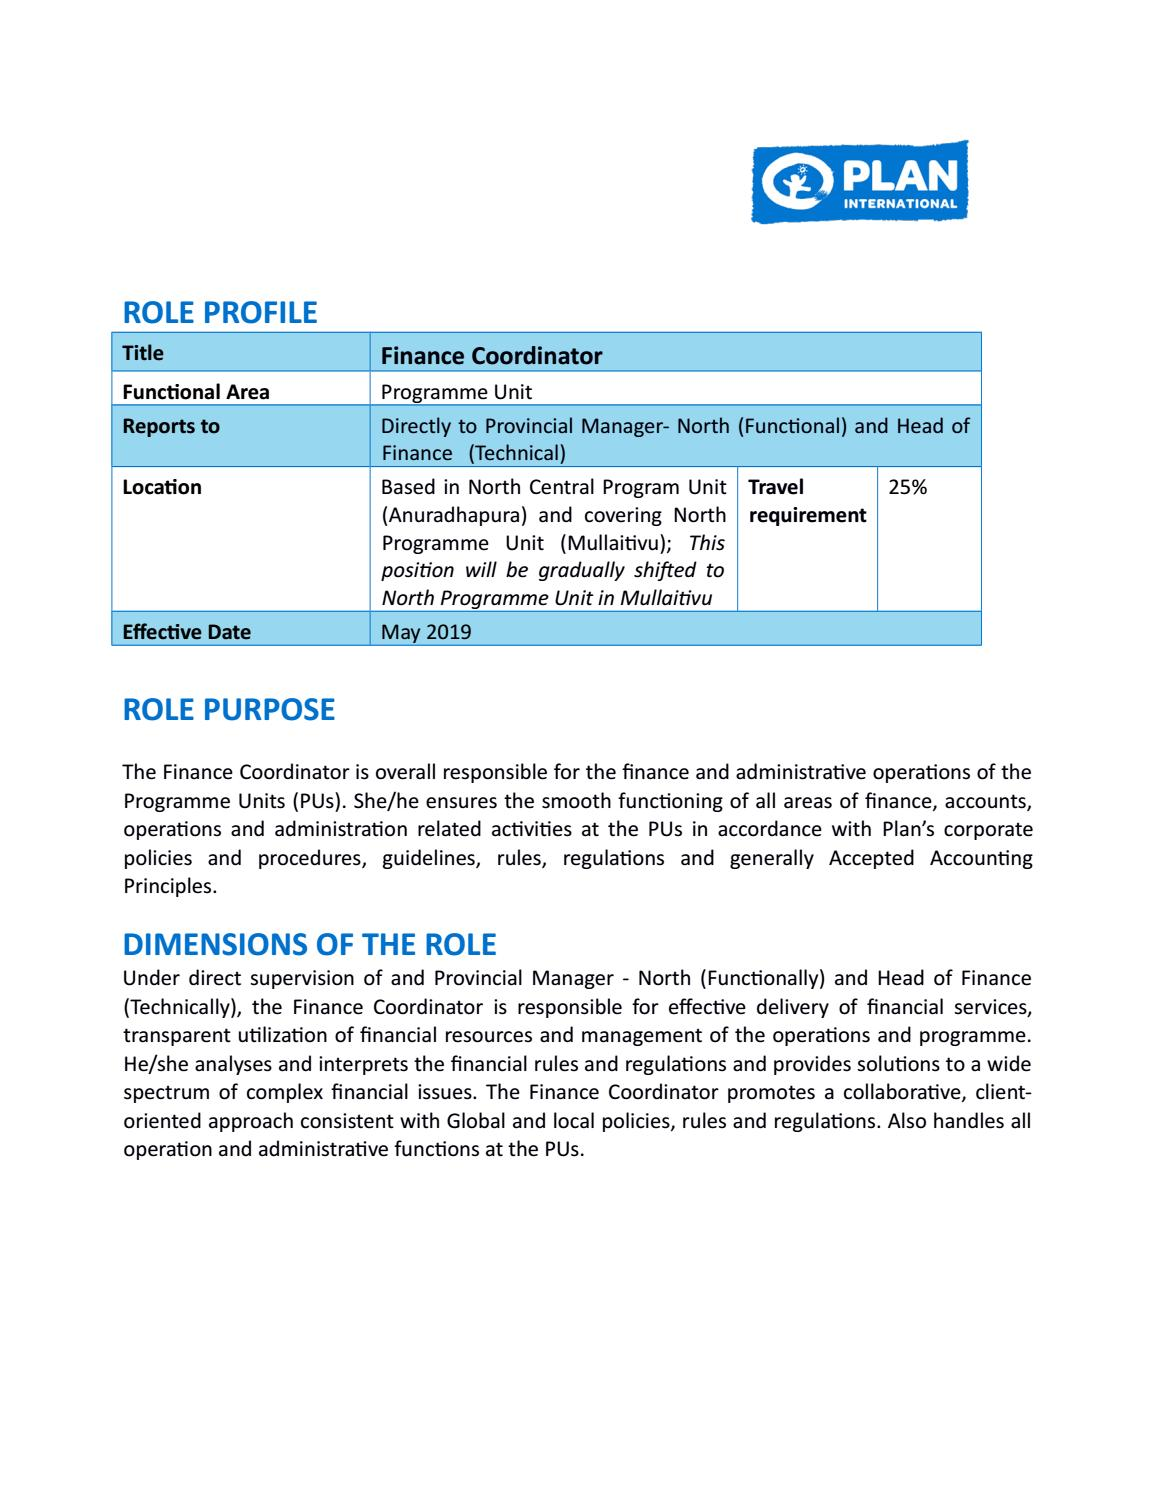 Formato PDF North -Central Finance Coordinator By Plan